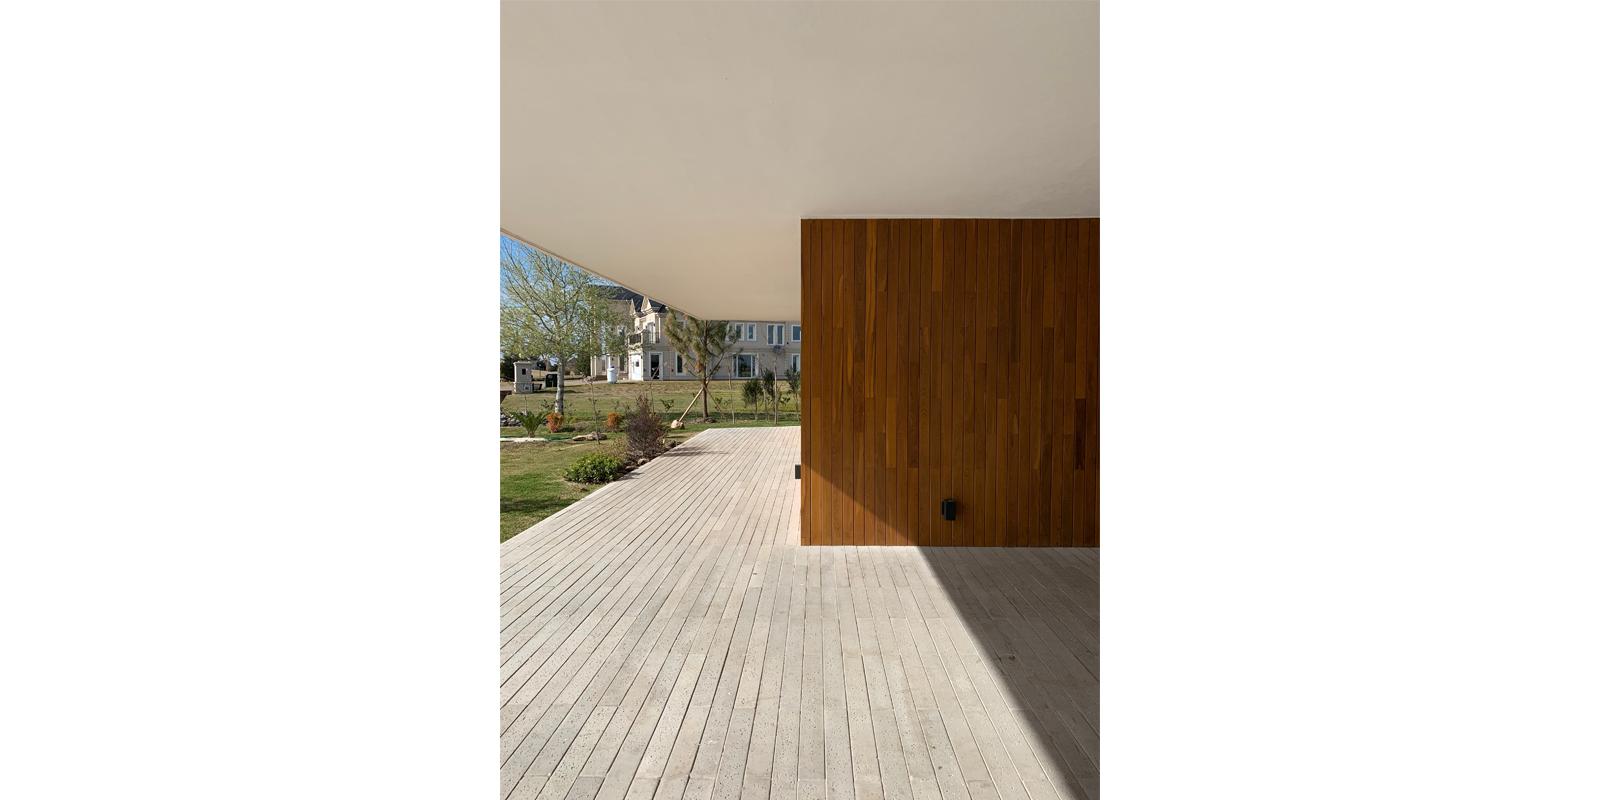 ProyectoC_Arquitectos_Portfolio_05_CasaSanEliseo